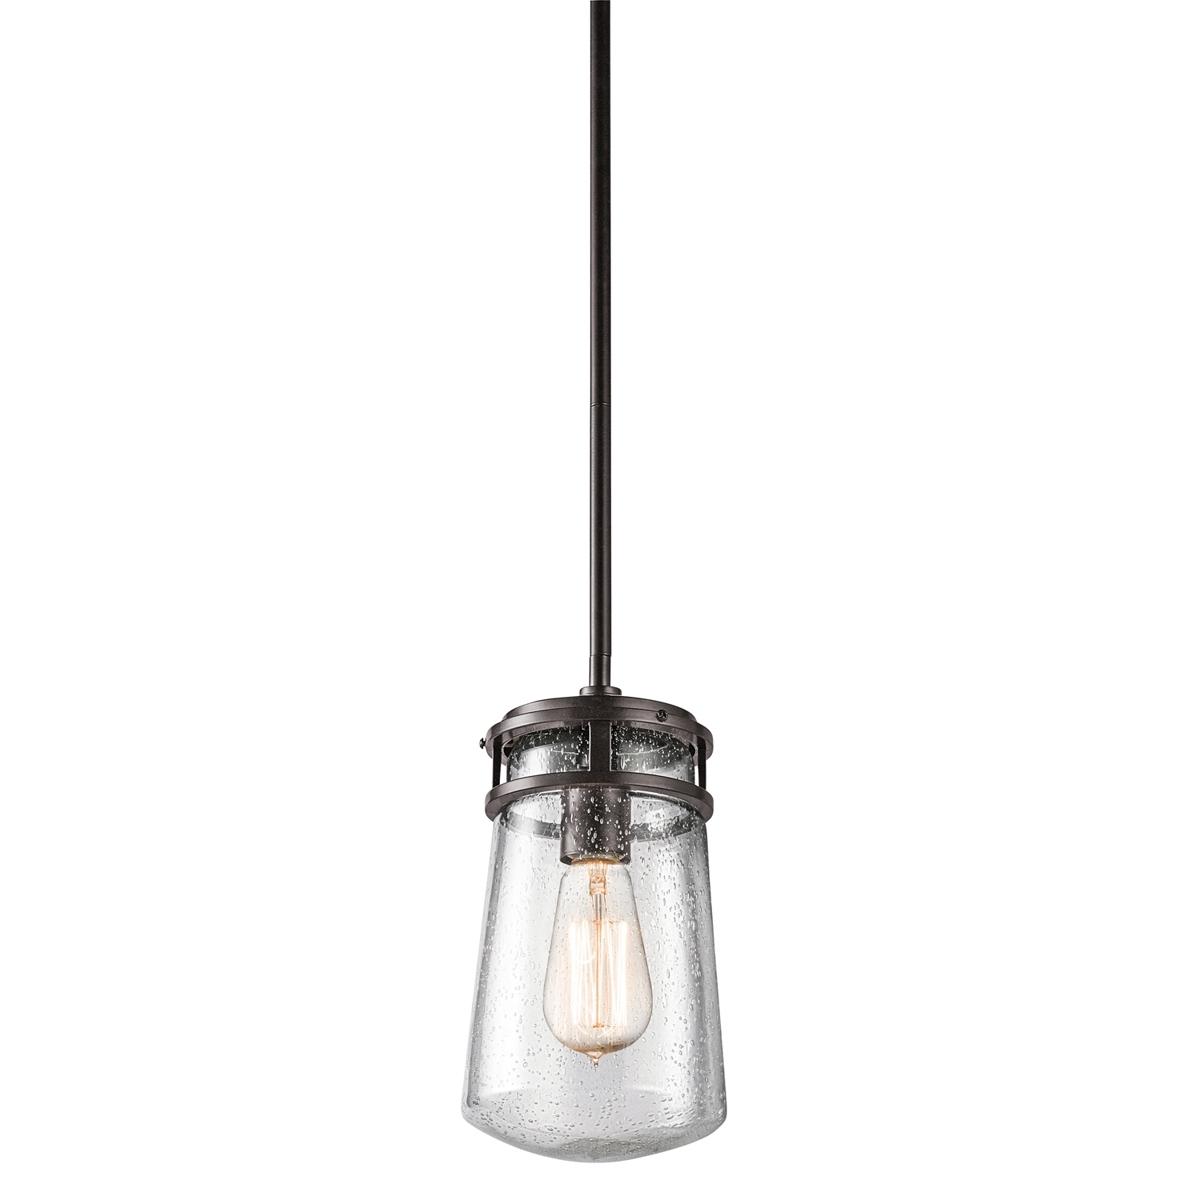 Nautical, Outdoor Hanging Lights, Outdoor Lights – Lamps Expo For 2018 Outdoor Hanging Lighting Fixtures (View 8 of 20)